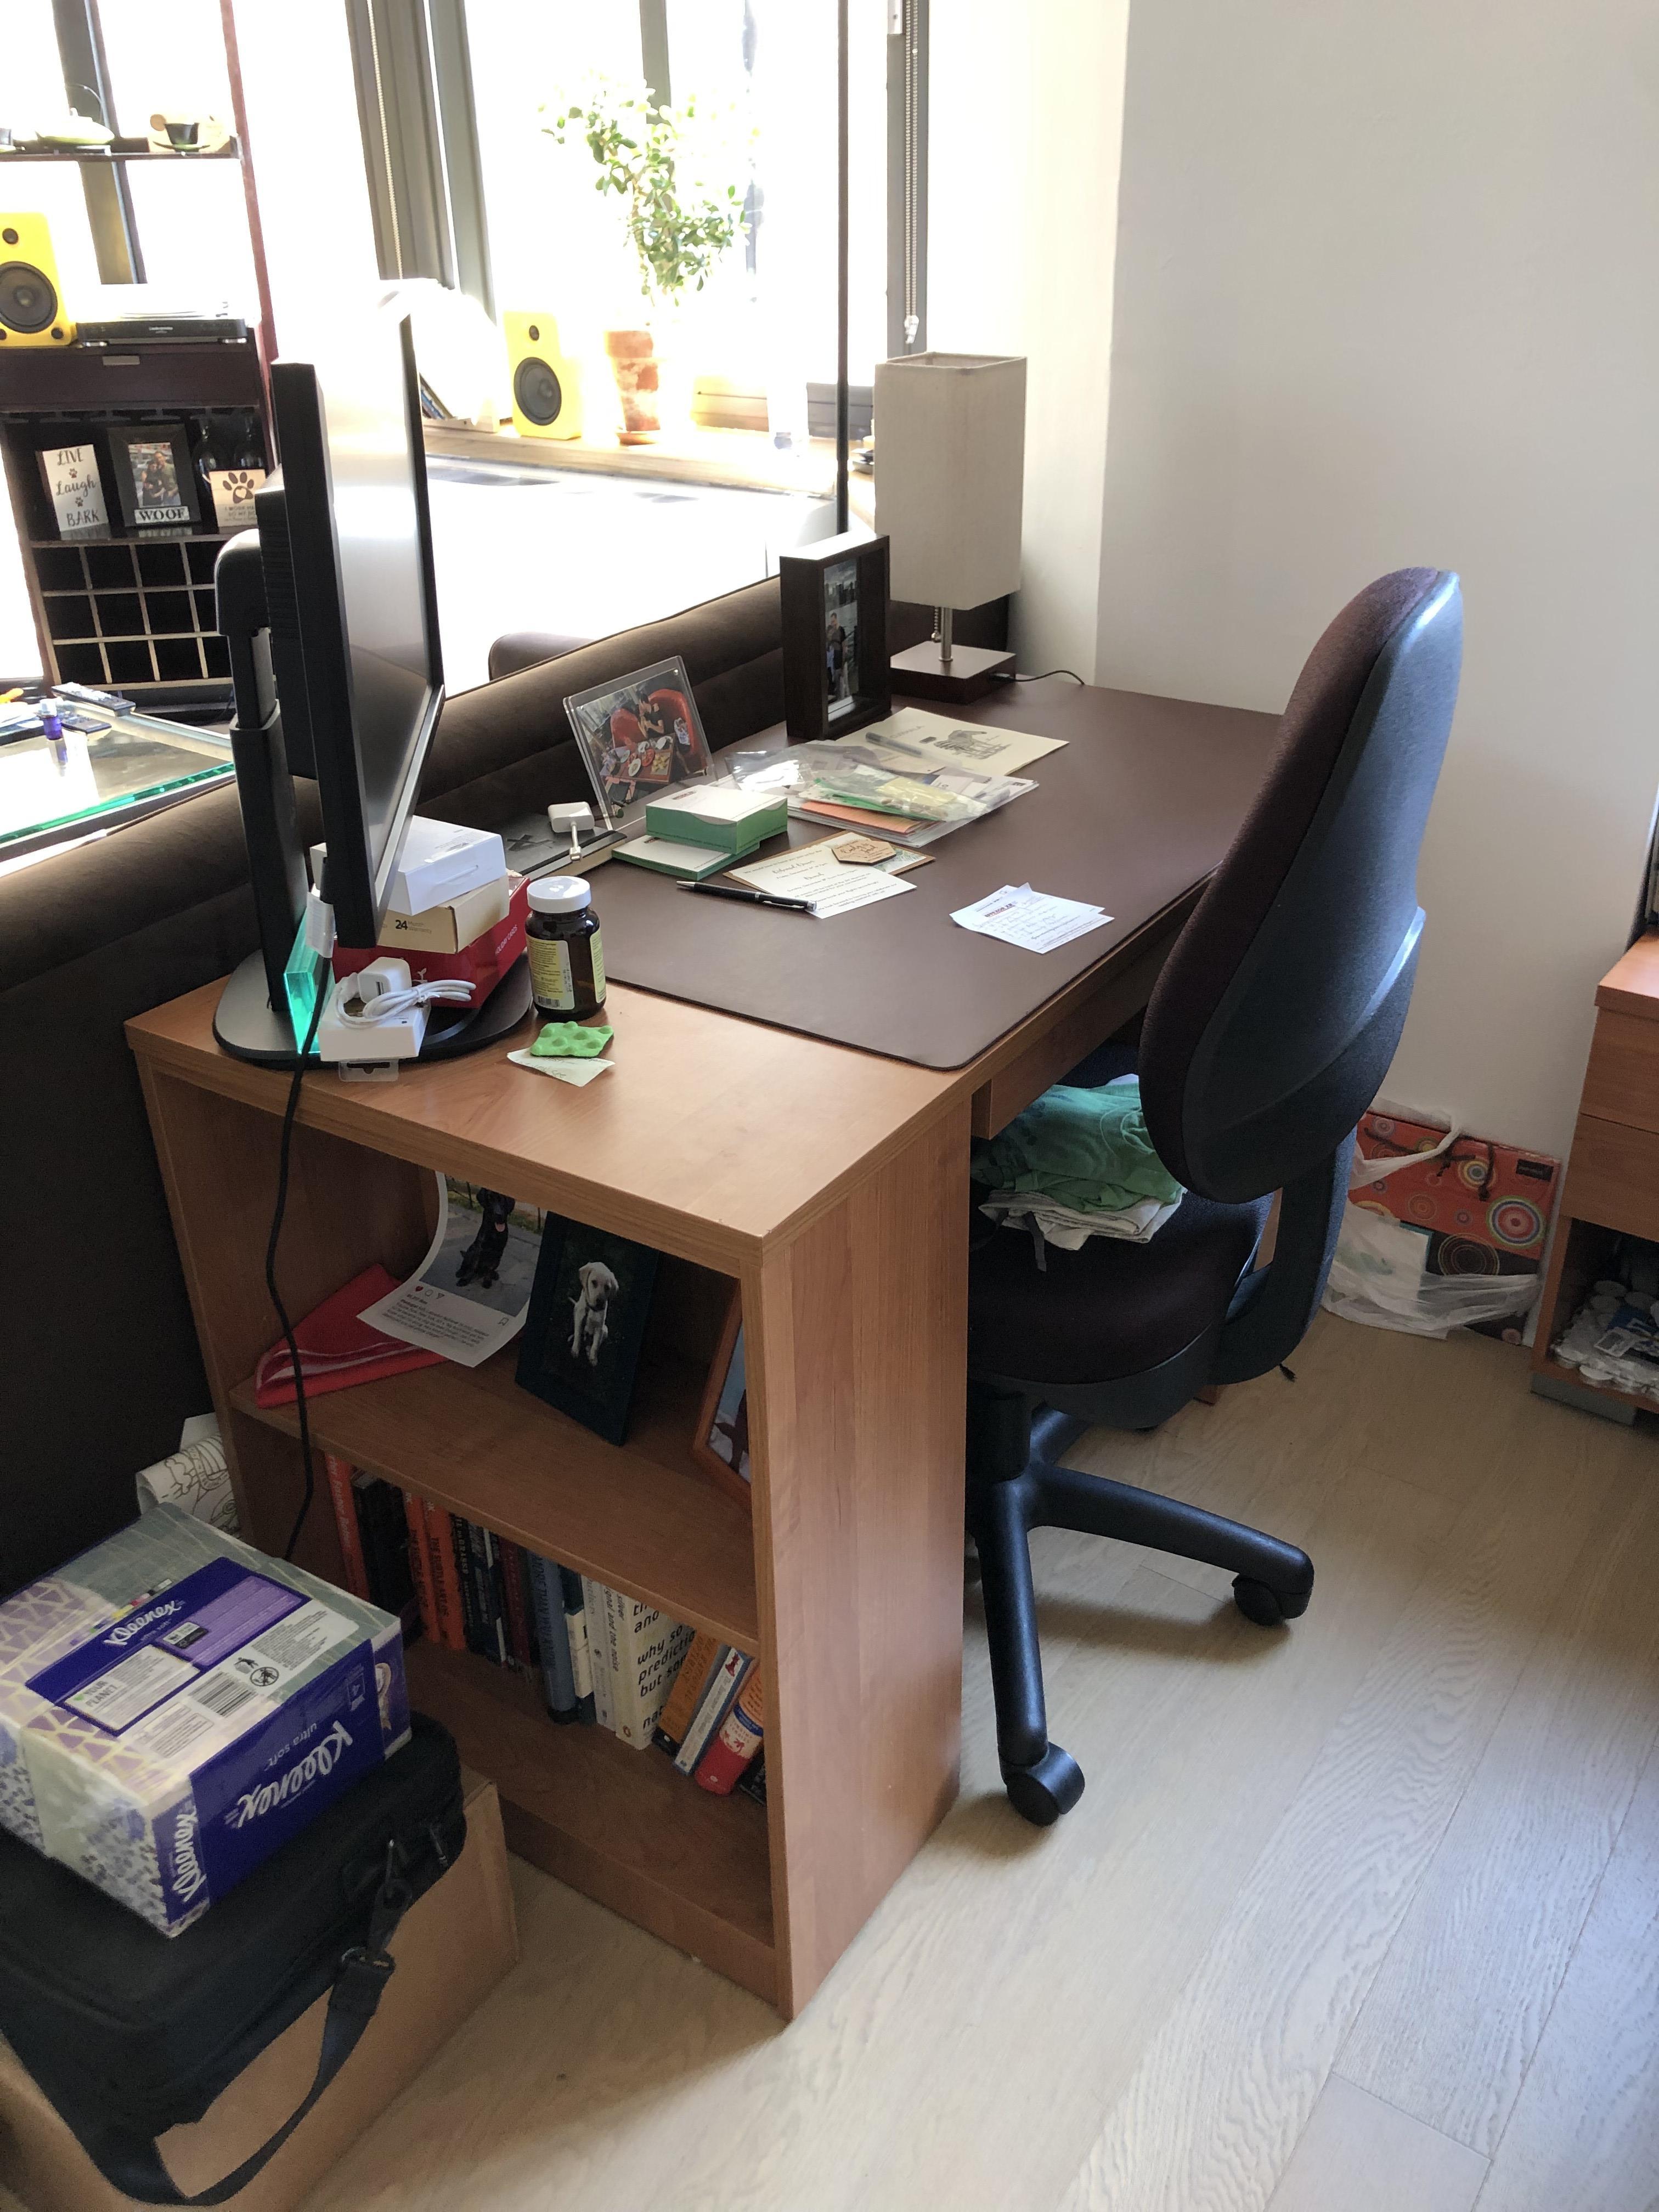 Wooden Desk w/ Drawers